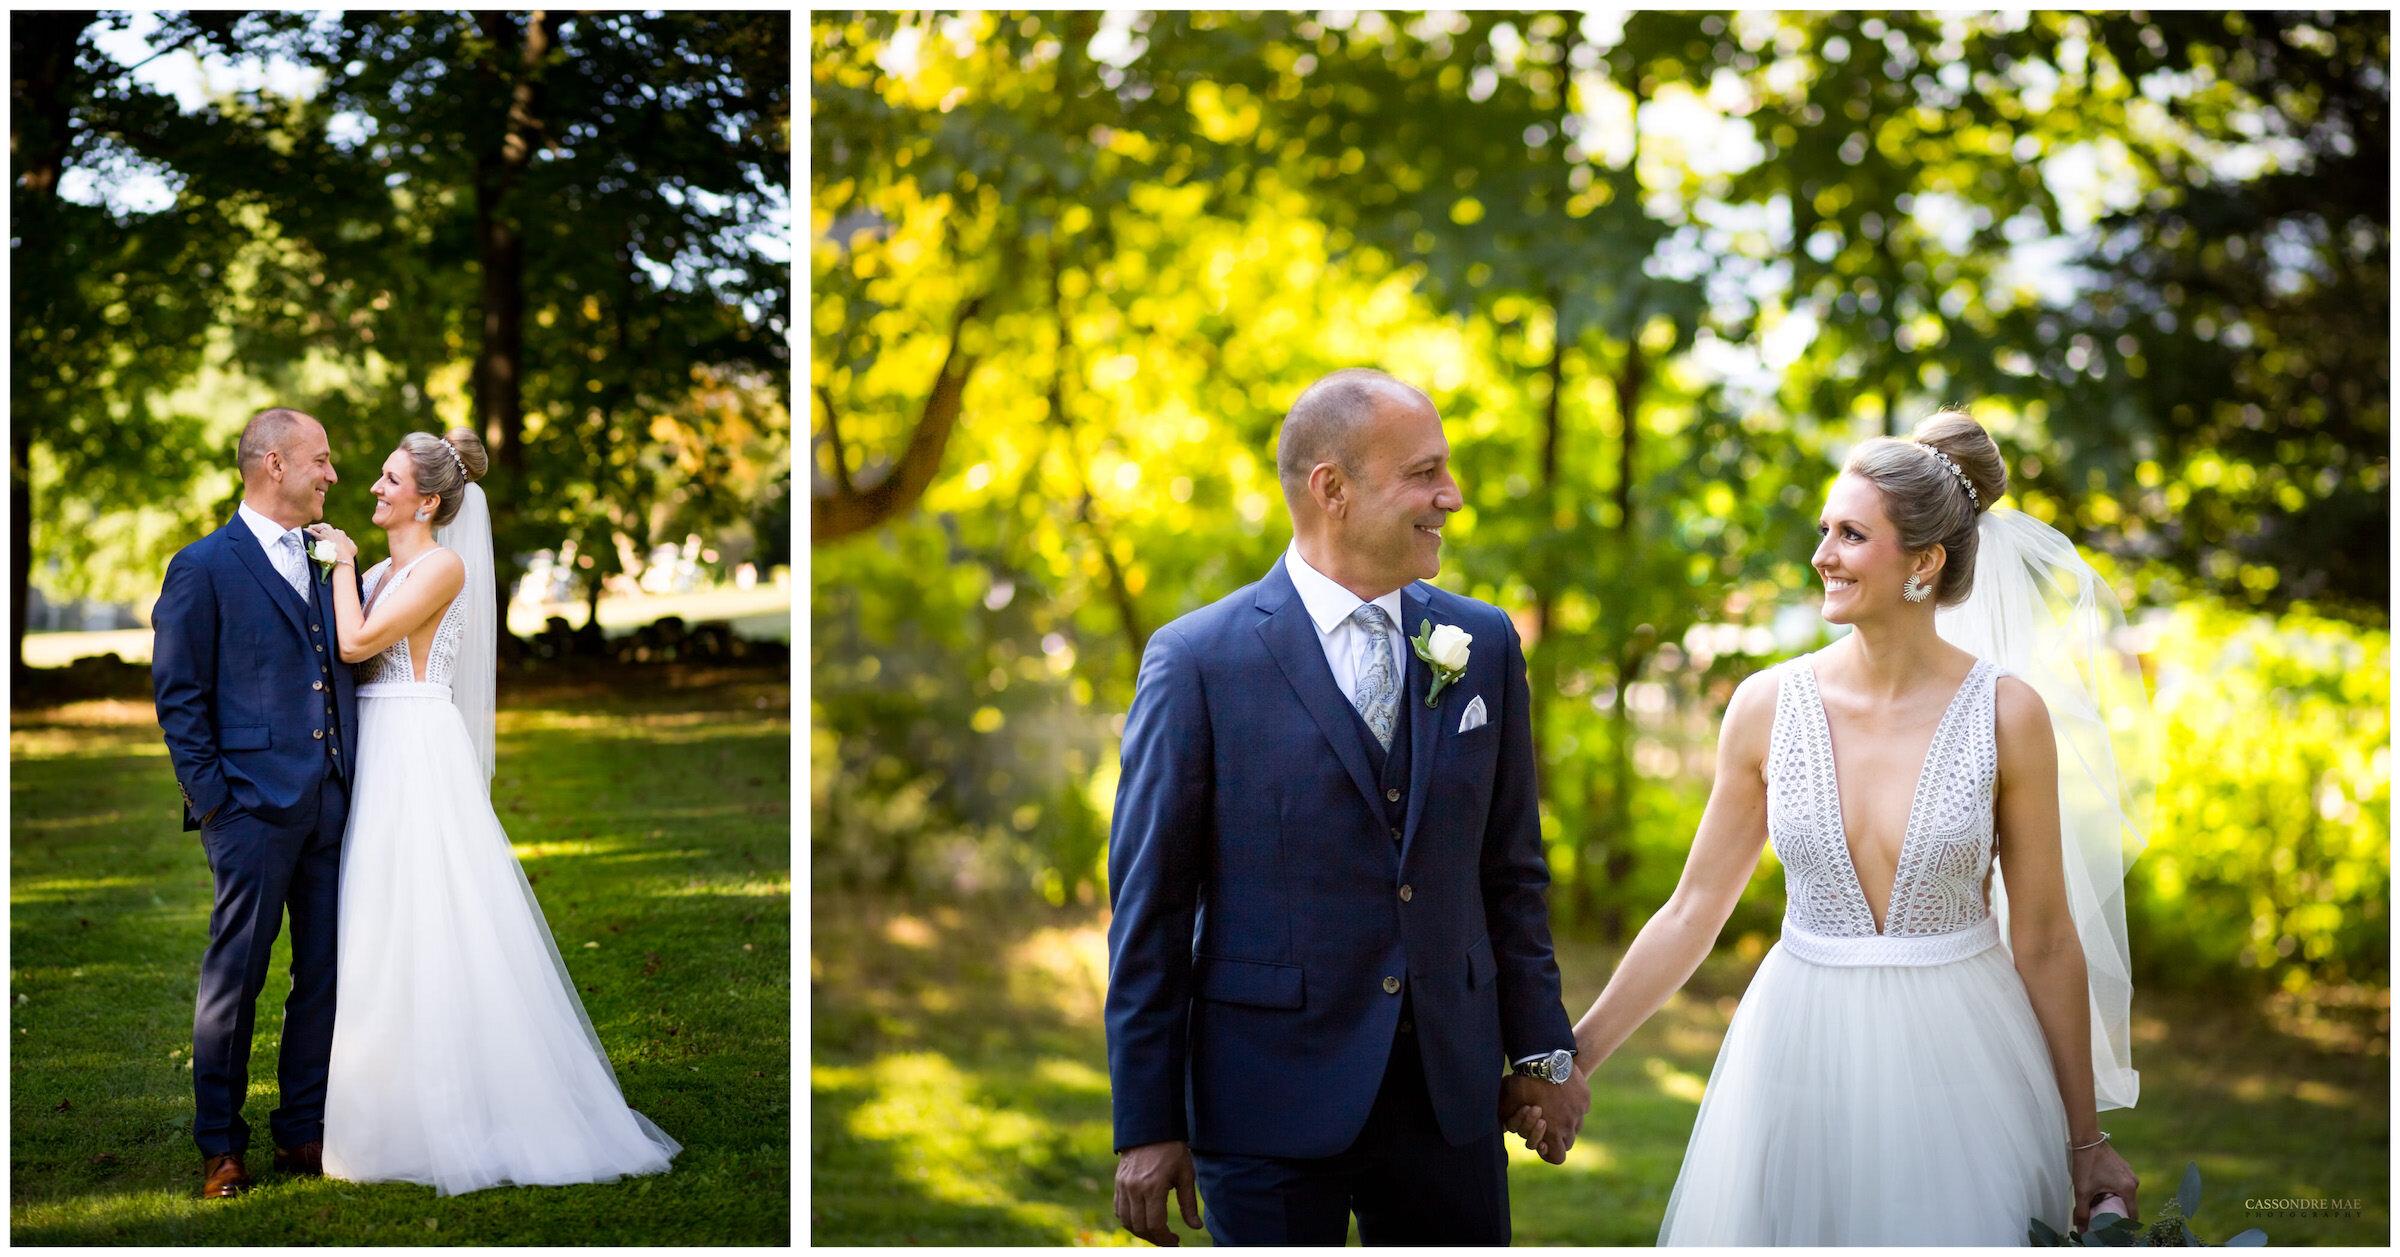 Cassondre Mae Photography Briarcliff Manor Wedding Photographer 10.jpg